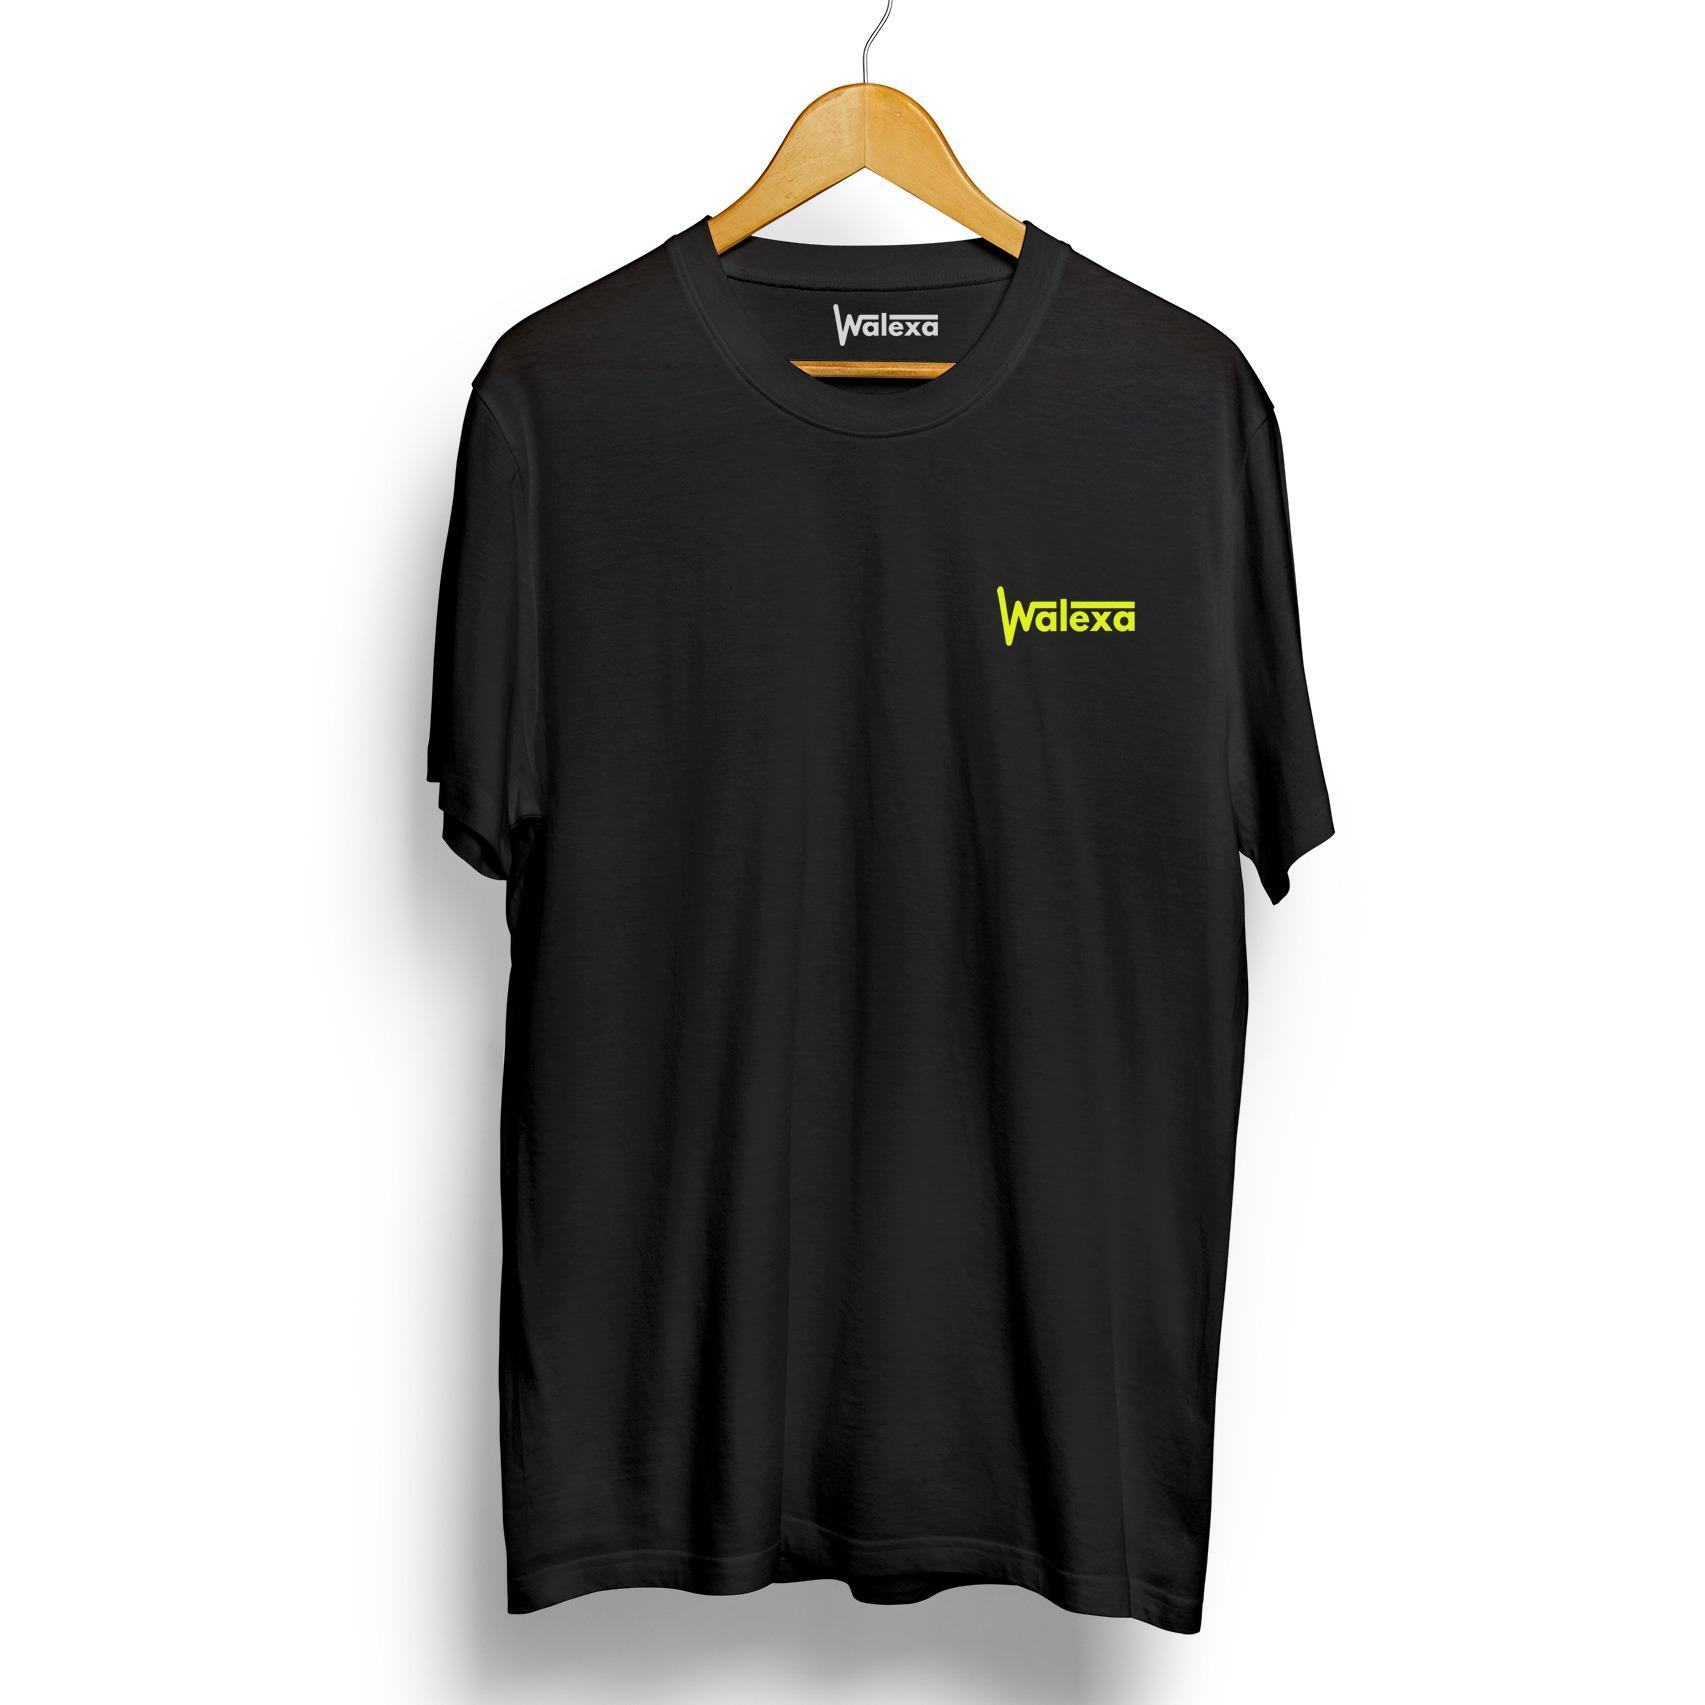 Walexa Original Walexa Kaos Distro Klasik Kualitas Premium Promo Baju Kaos Murah